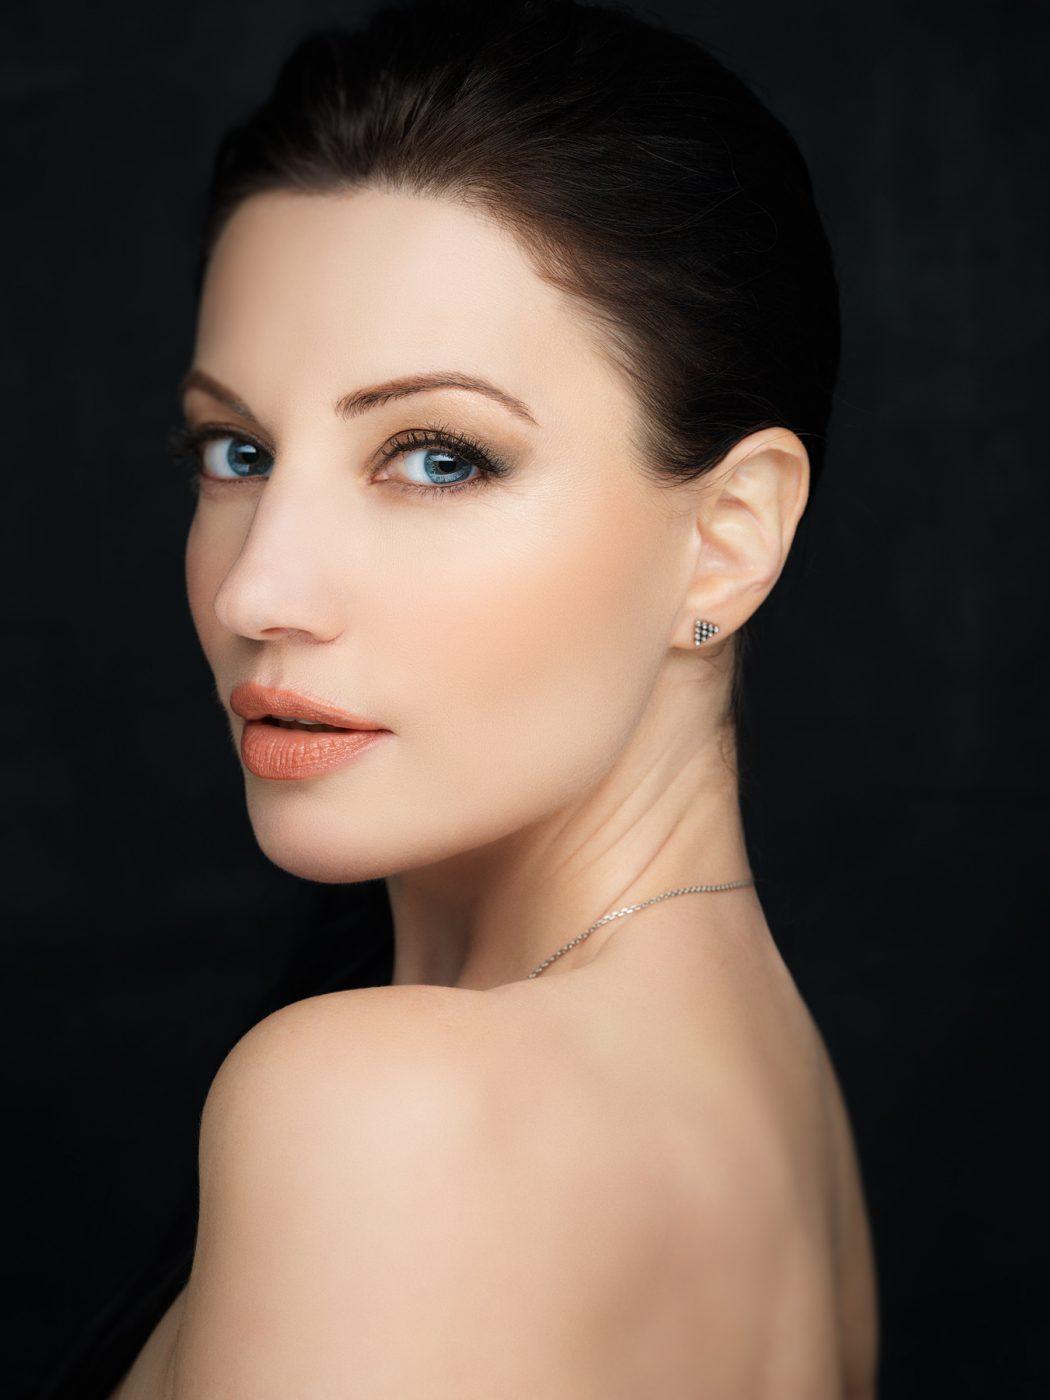 beauty headshot, makeup photography, fashion portrait